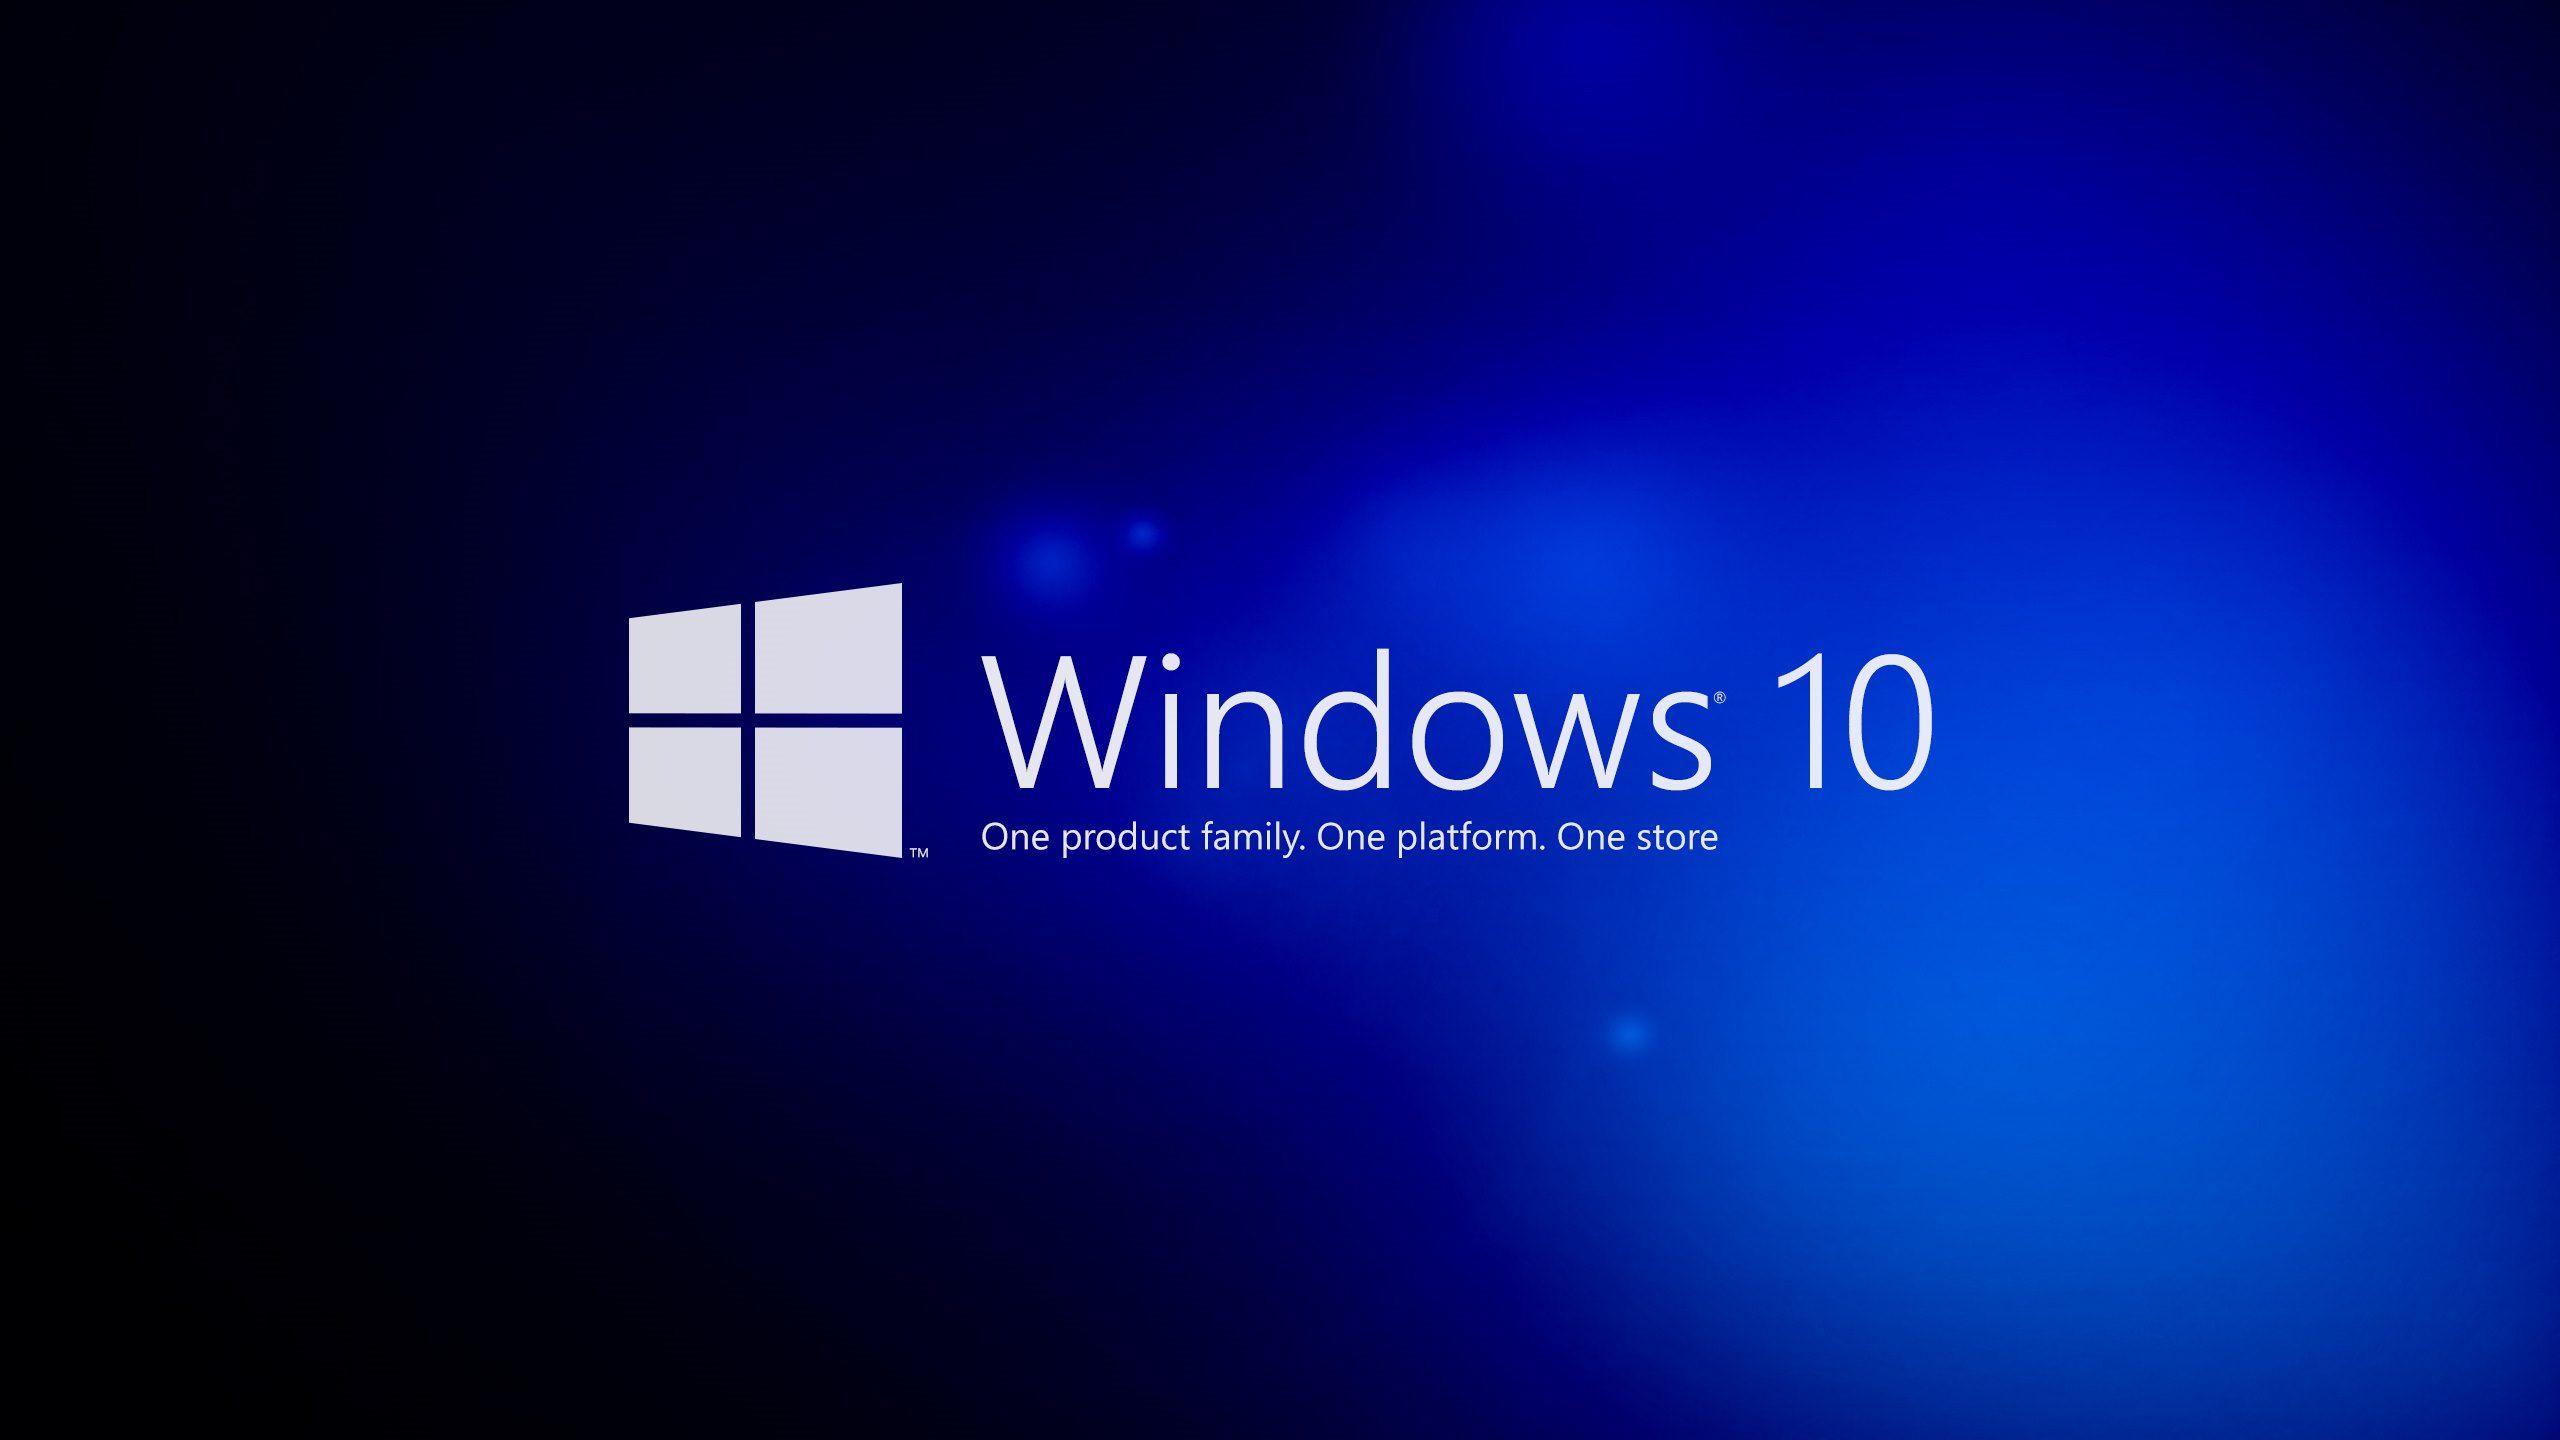 Windows 10 Upgrade Compatibility Issues Windows 10 Microsoft Windows 10 Download Windows 10